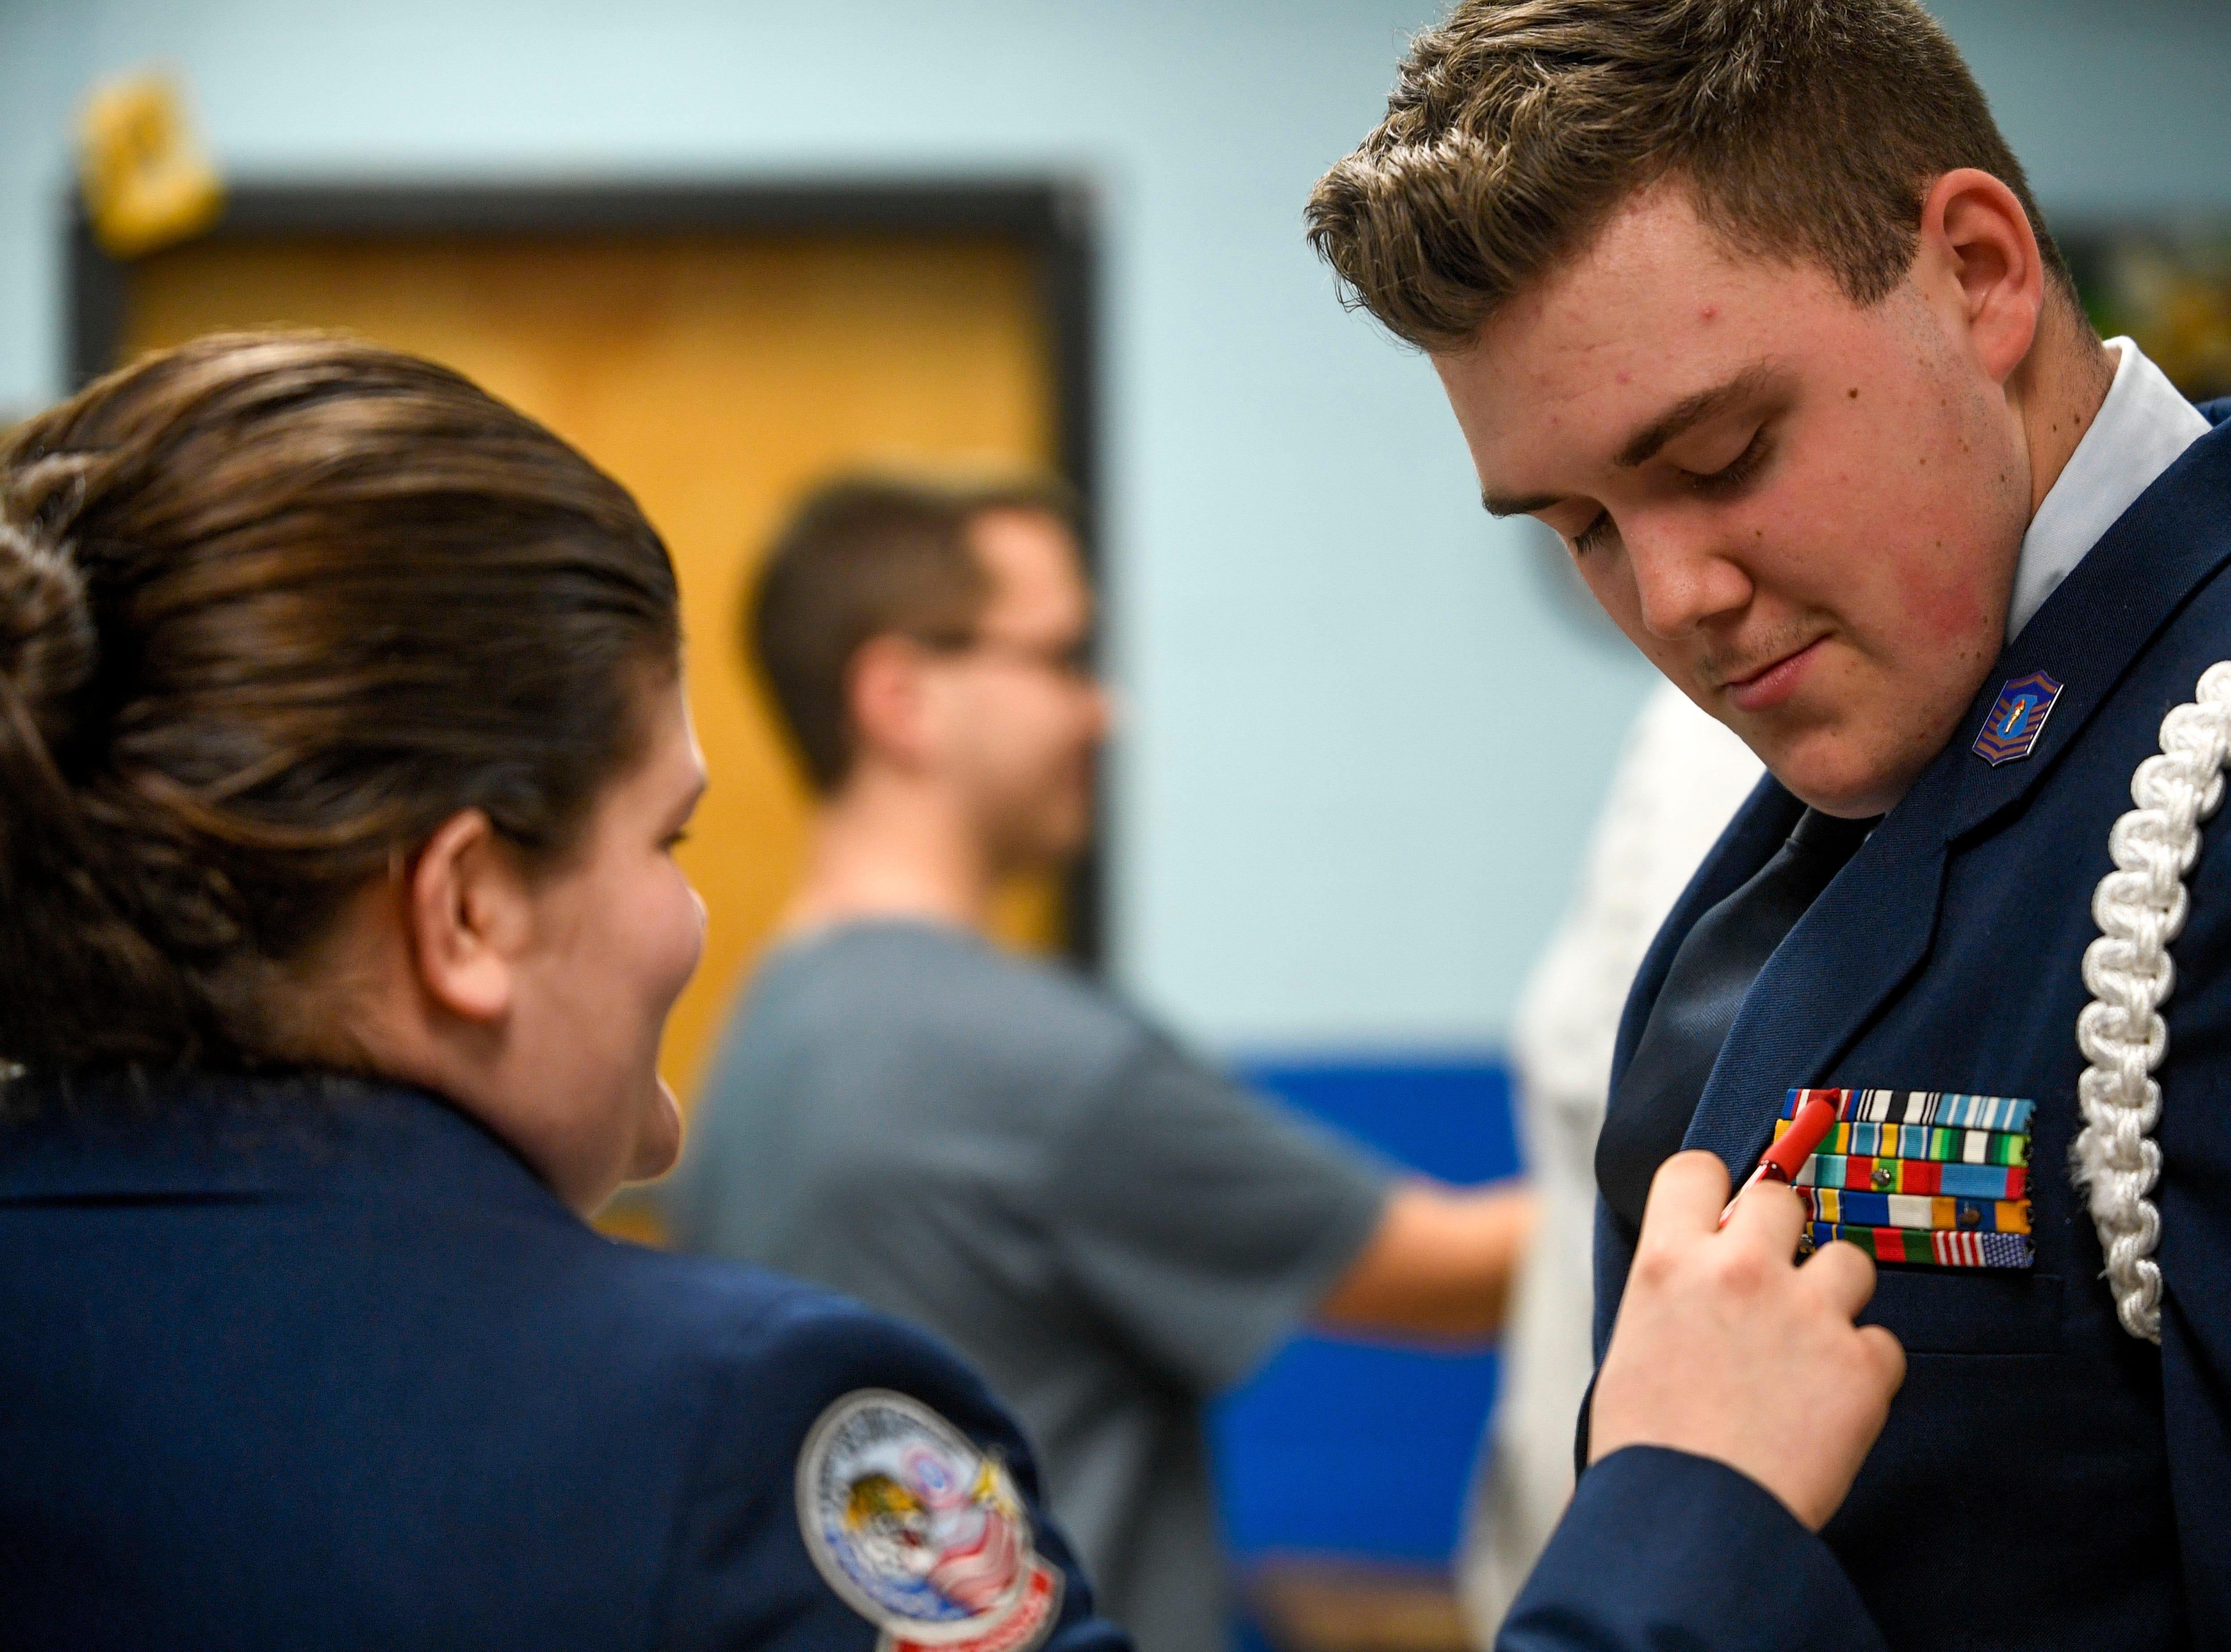 Kendalynn Henley, left, 16, a junior, performs a uniform inspection with Kaleb Bull, 17, a sophomore, right, during ROTC class at Lexington High School in Lexington, Tenn., on Wednesday, Feb. 6, 2019.